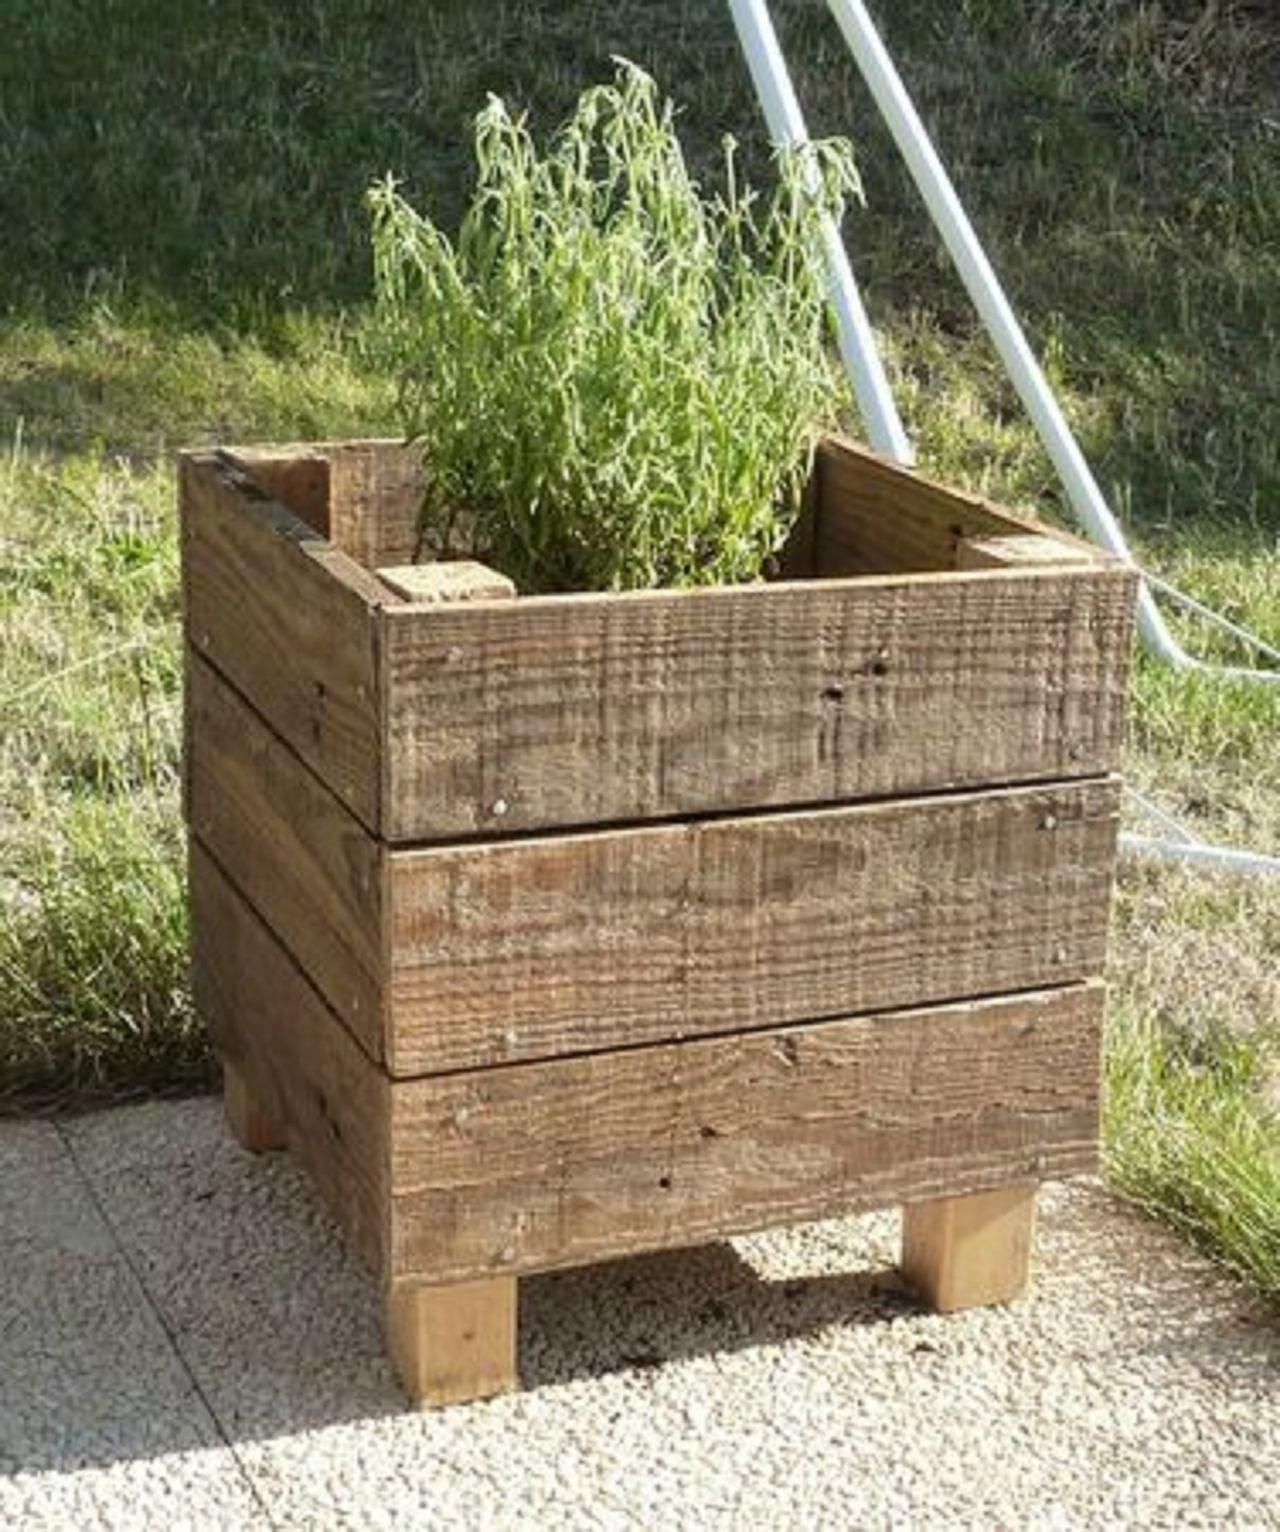 Bloembakken Van Pallethout Pallet Planter Box Wood Pallet Planters Pallets Garden